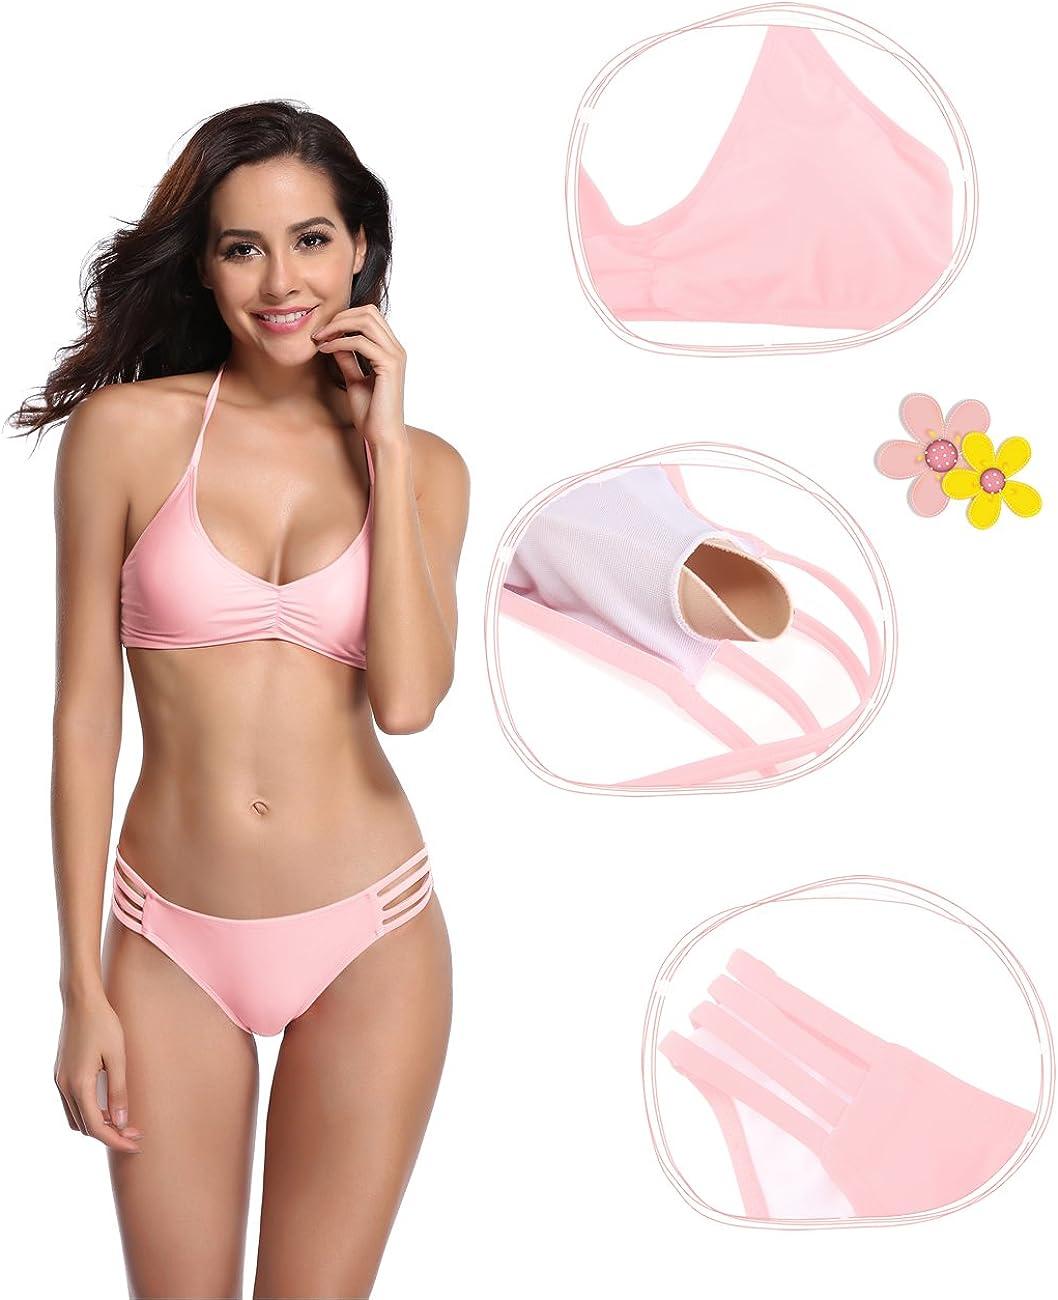 SHEKINI Damen Bikini Set Elegant Neckholder Gepolstert Bandage Bikini Raffung Push up Oberteil Bikinihose Bademode Badeanz/üge